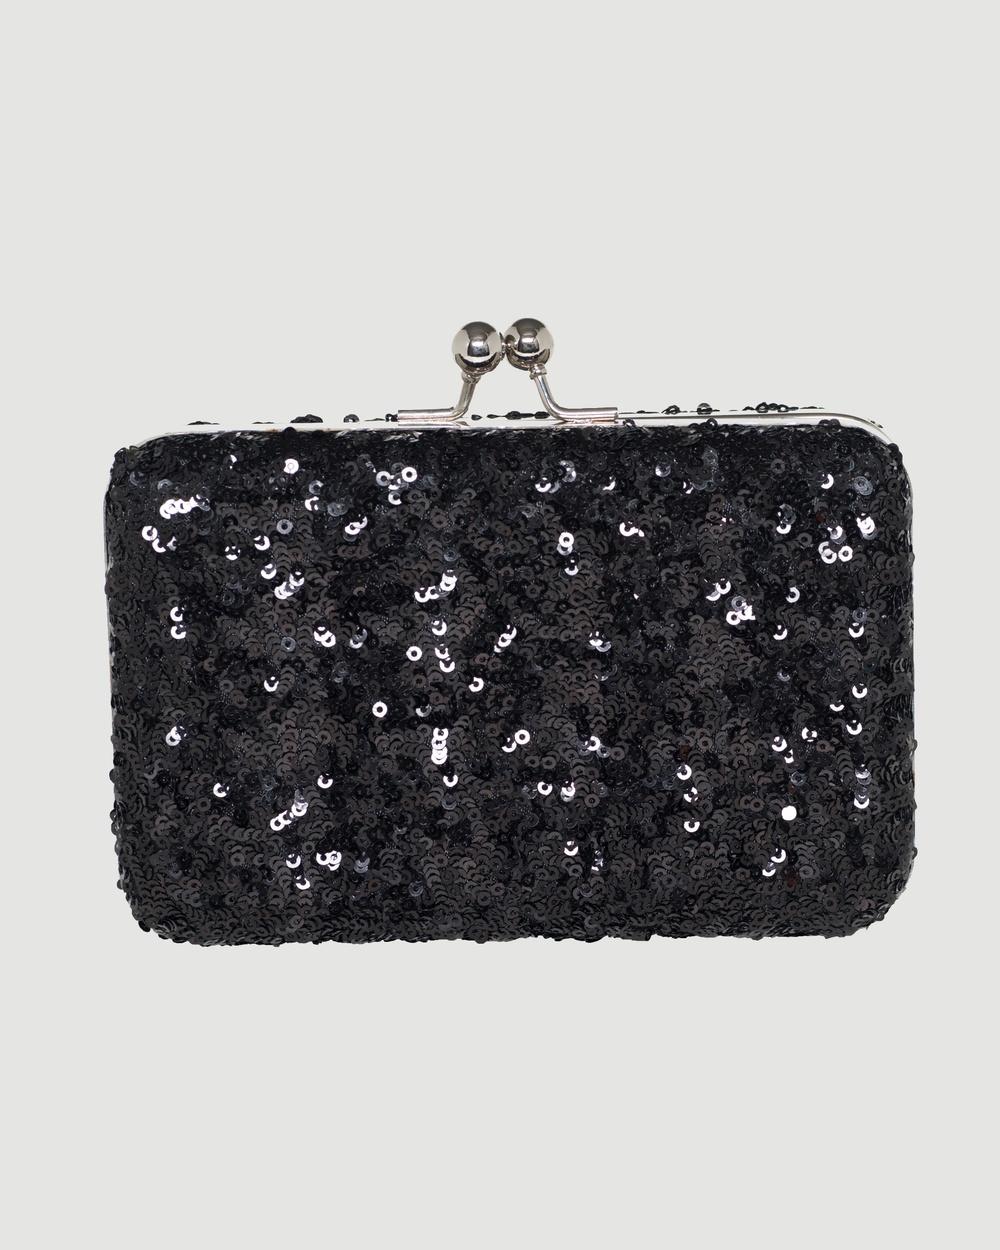 Marlafiji Liz Clutch Bags Black Leather bags Australia